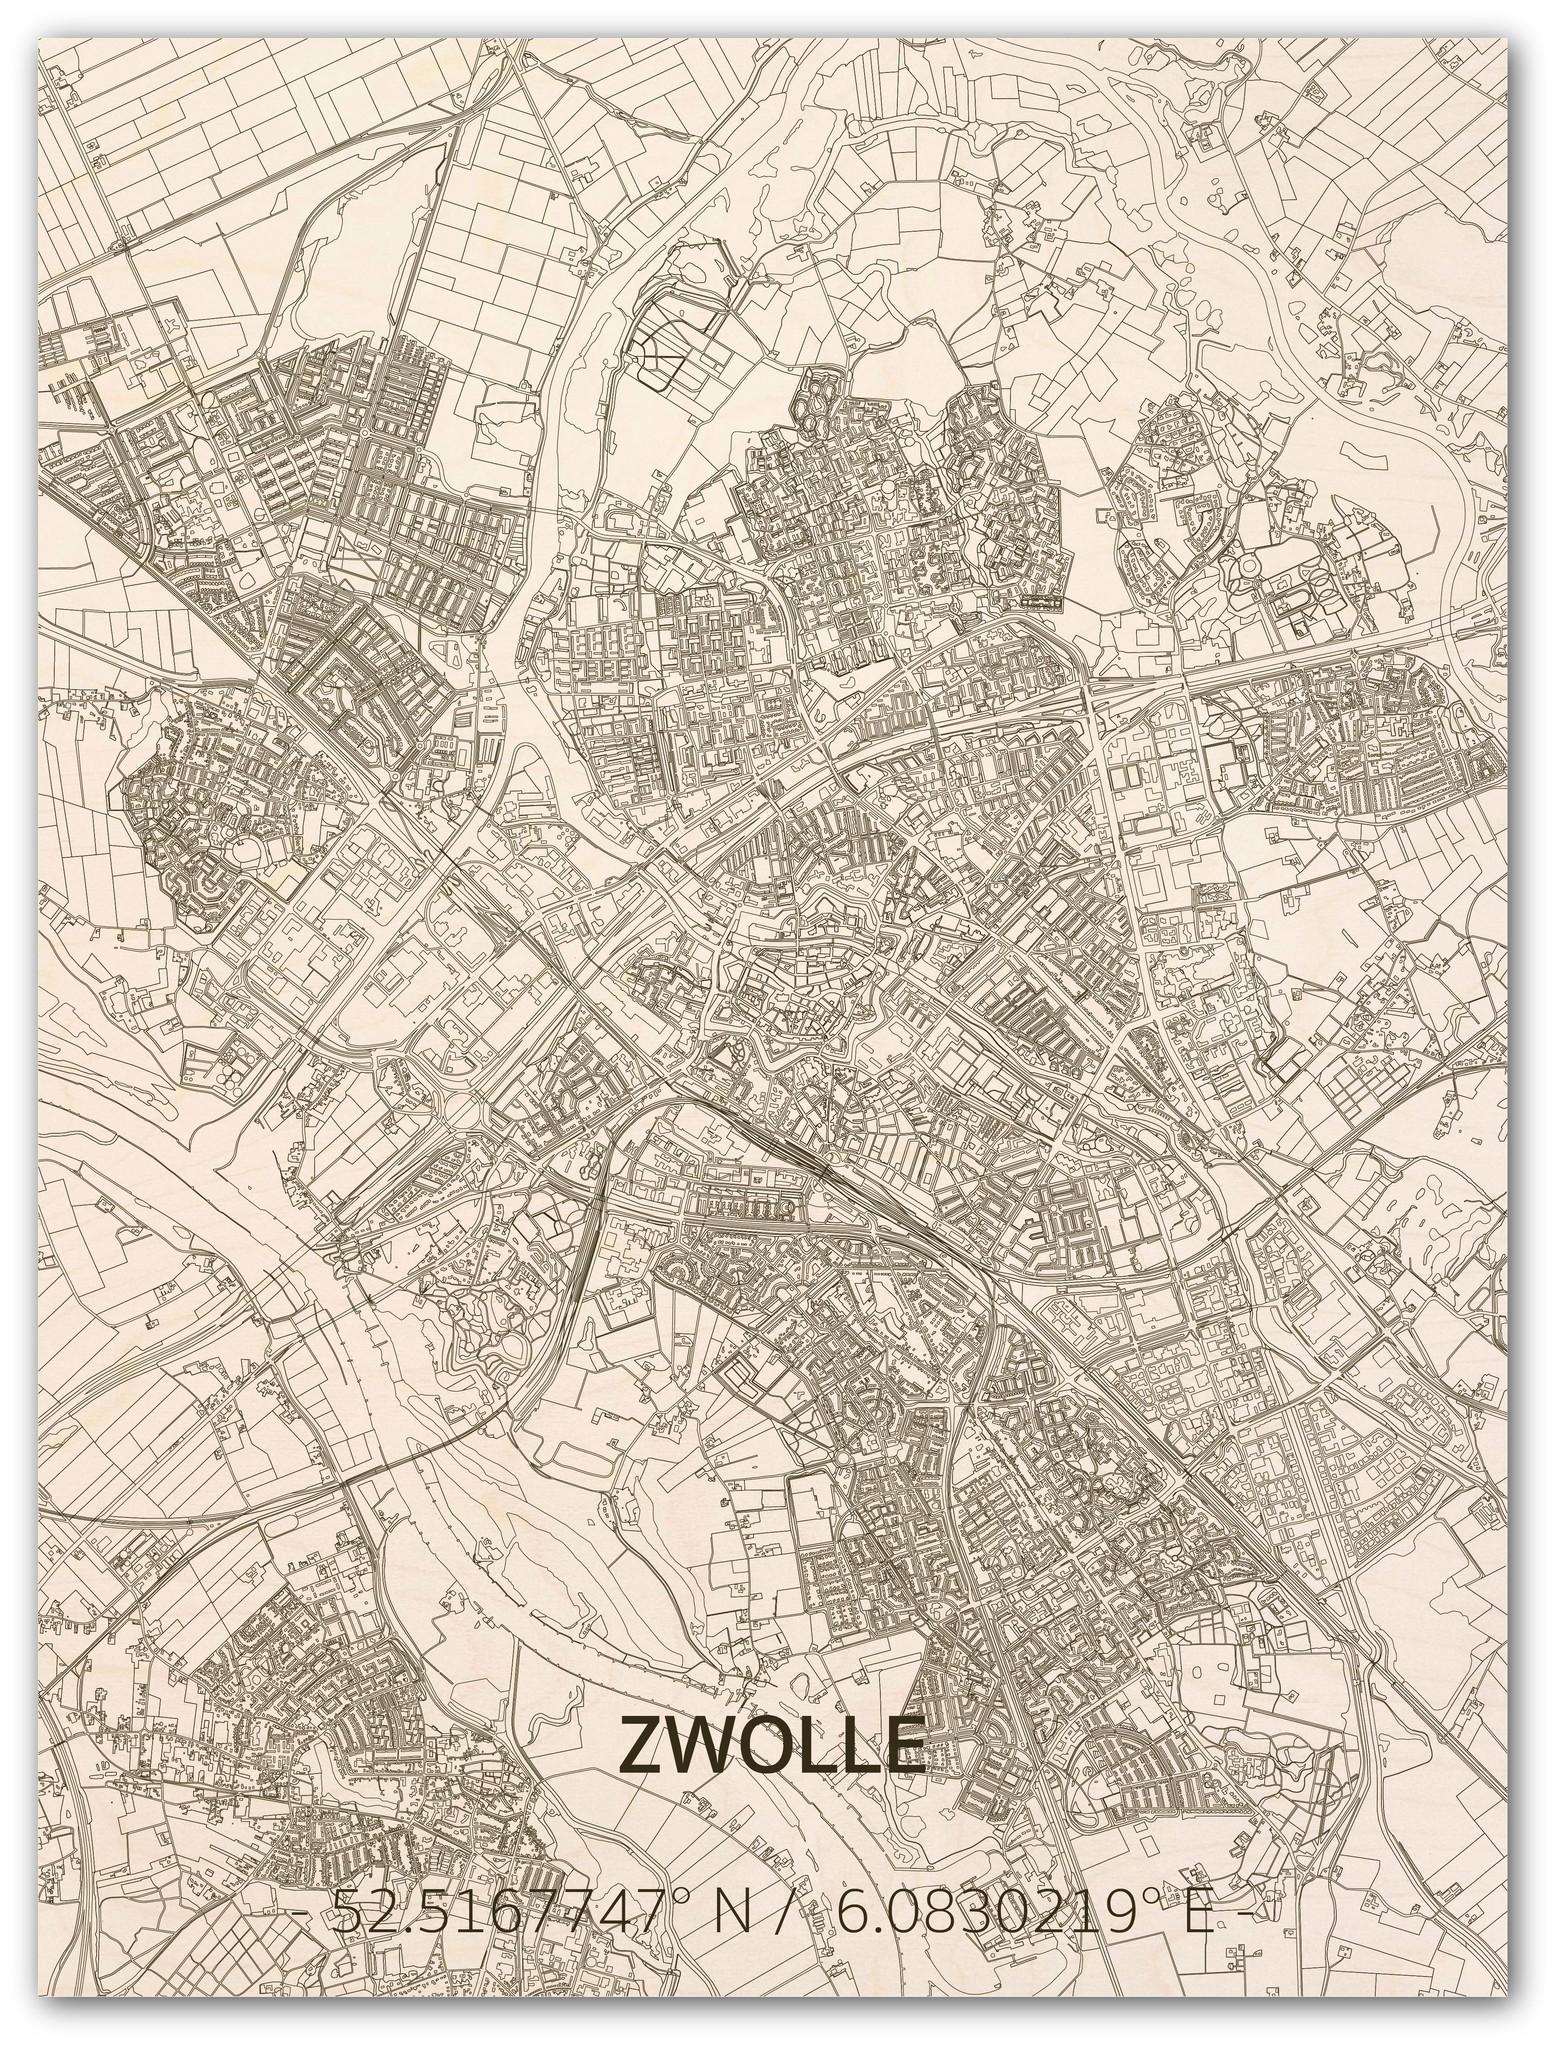 SALE | Zwolle | SALE-1